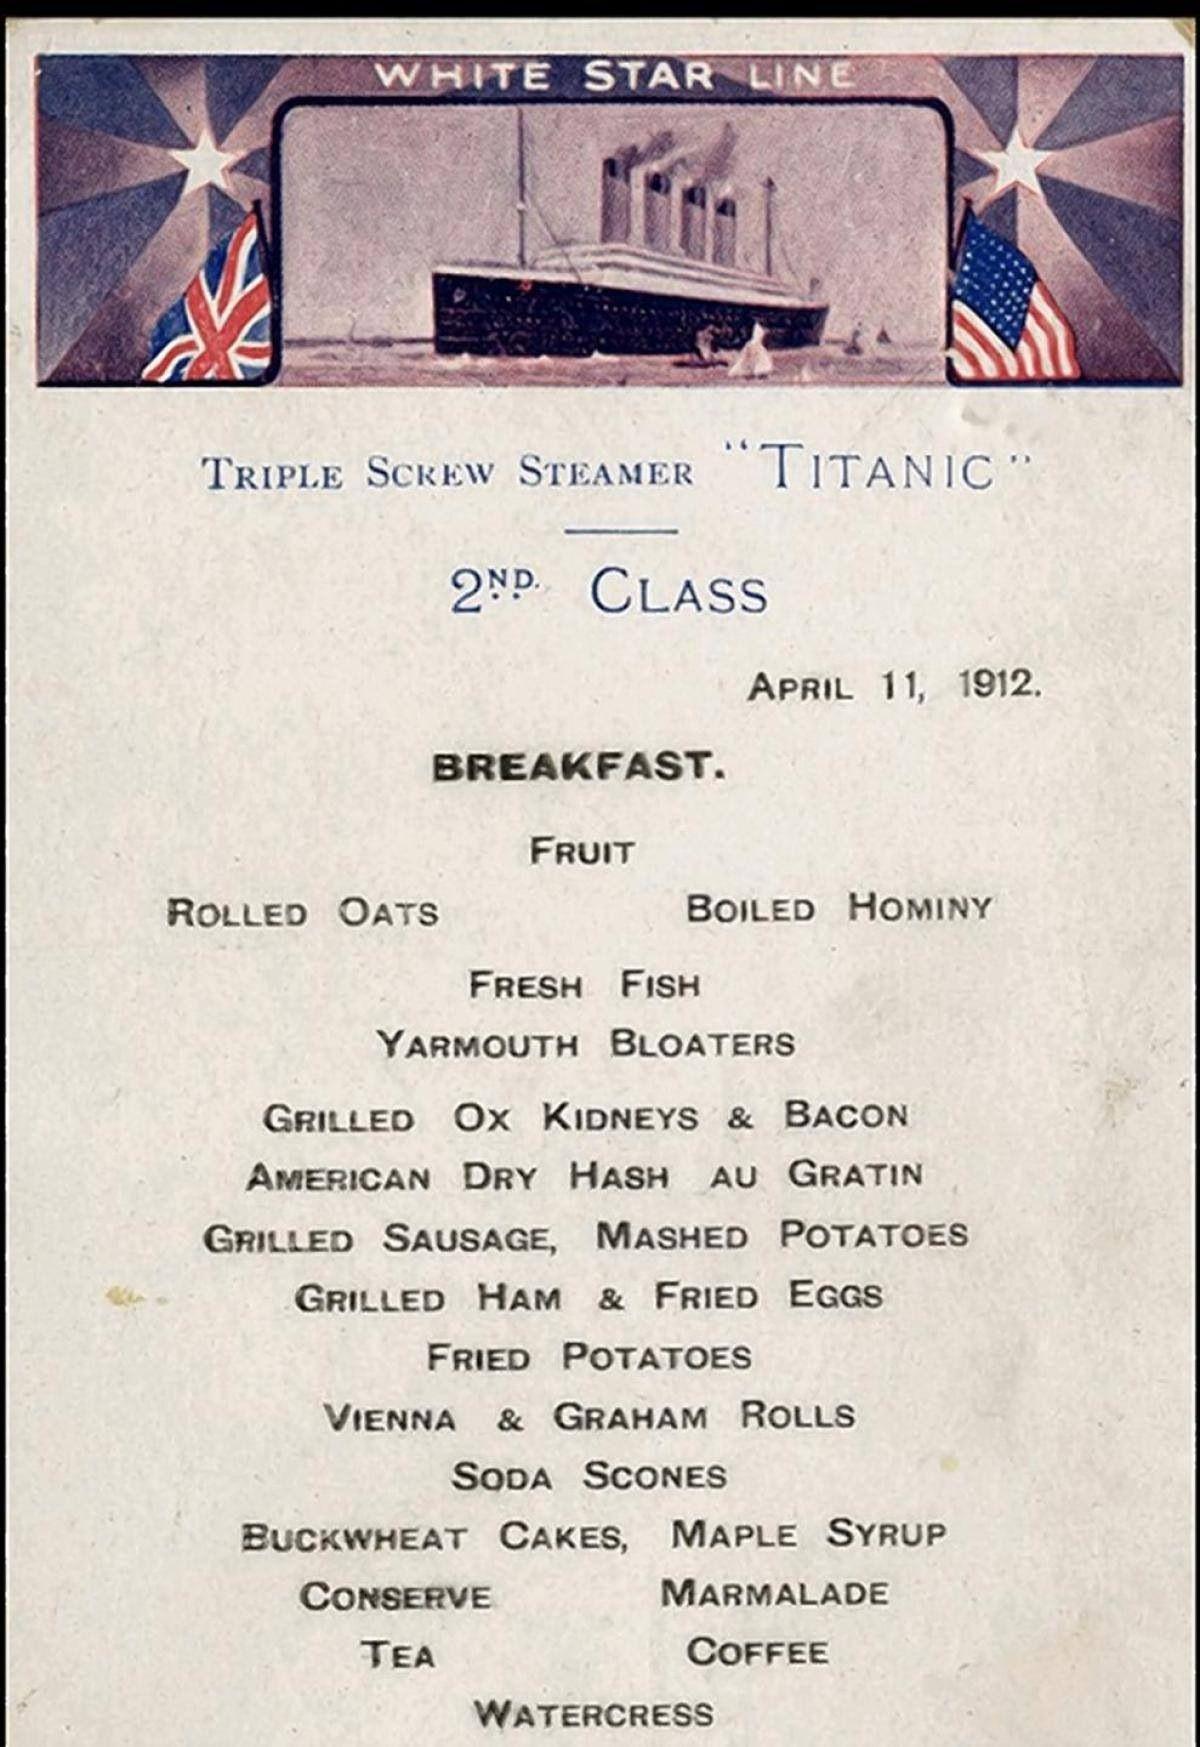 Titanic's second class restaurant menu